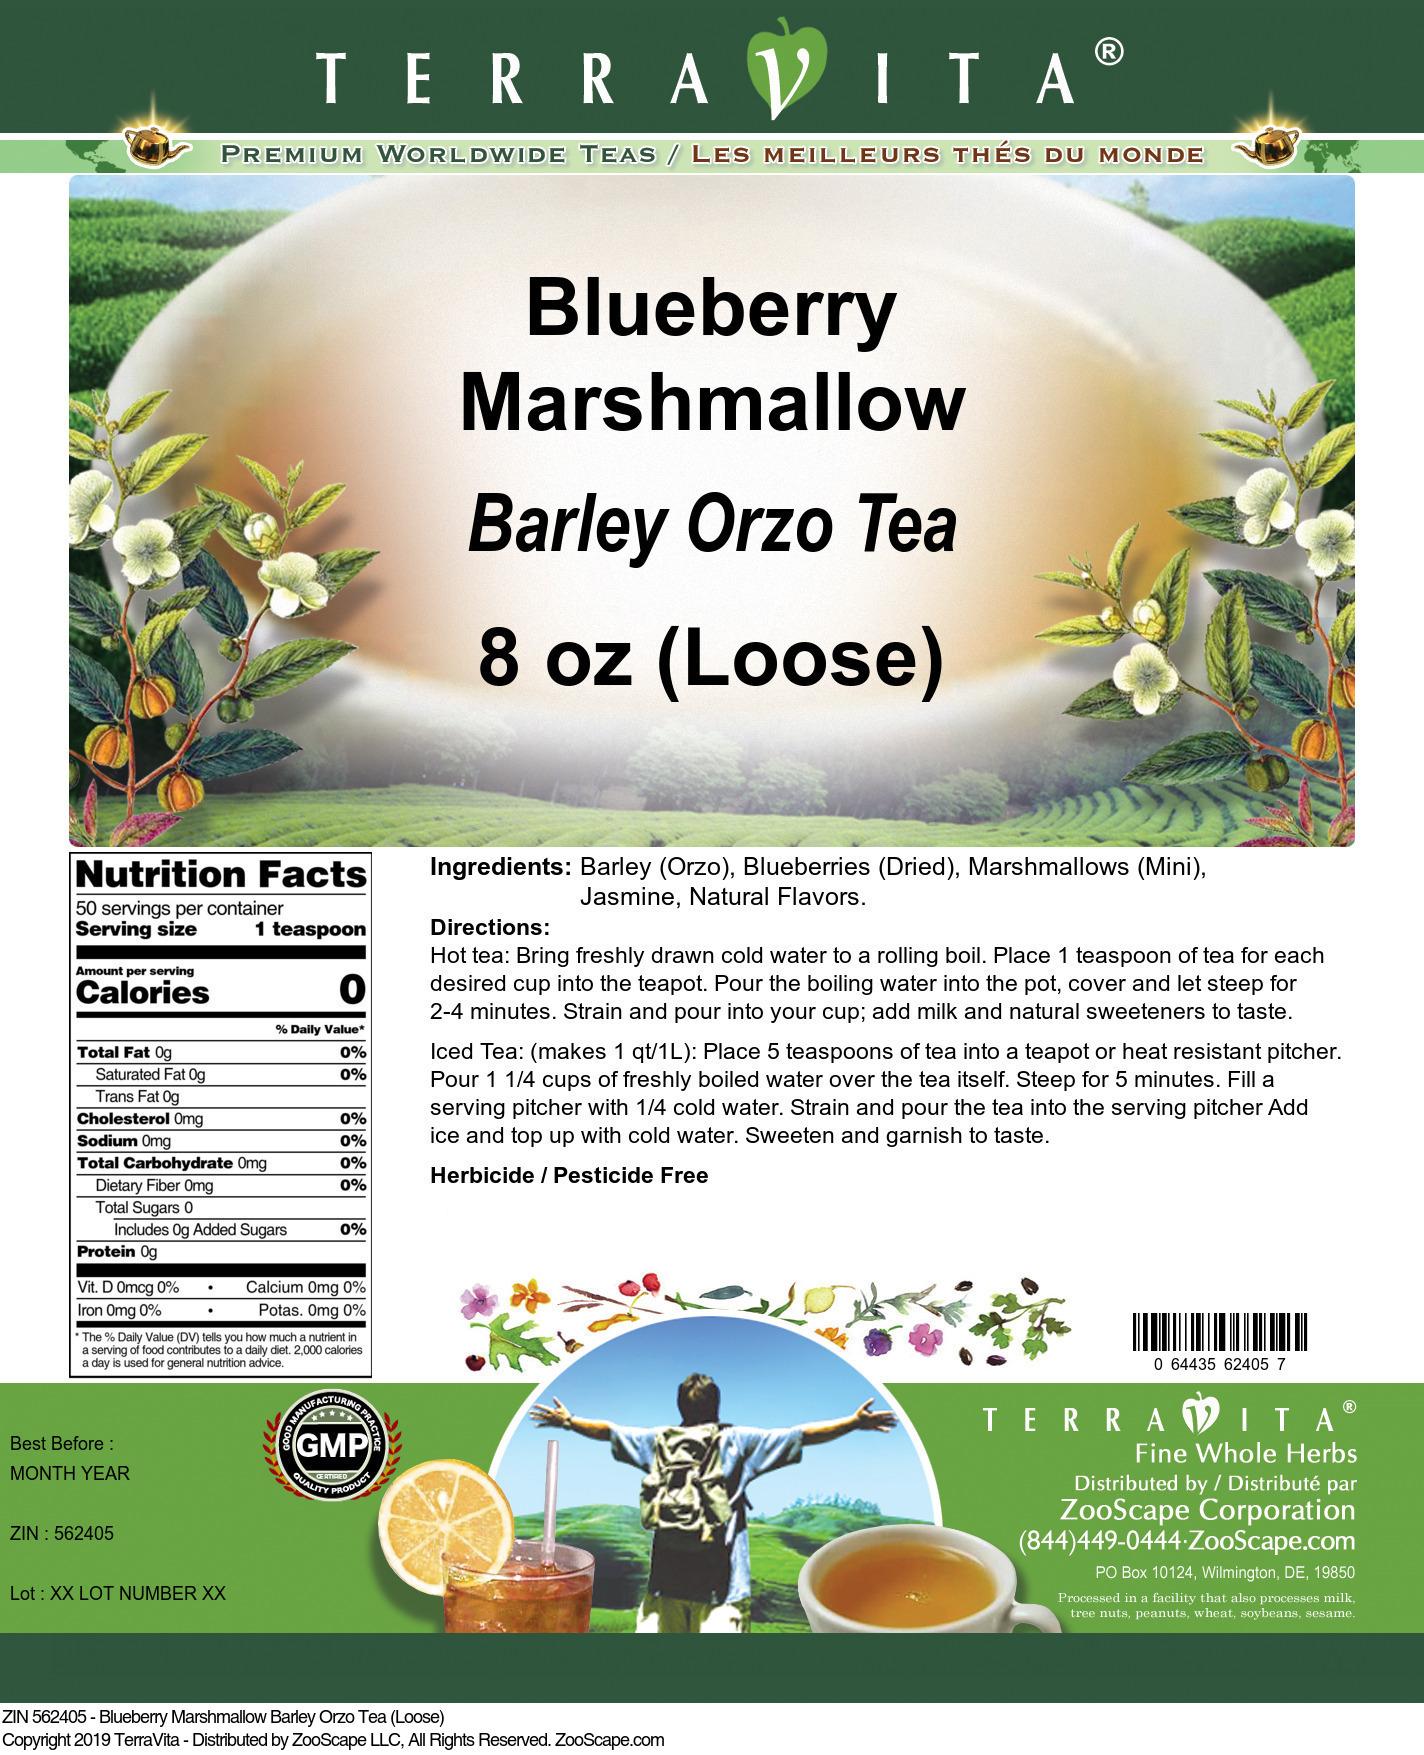 Blueberry Marshmallow Barley Orzo Tea (Loose)